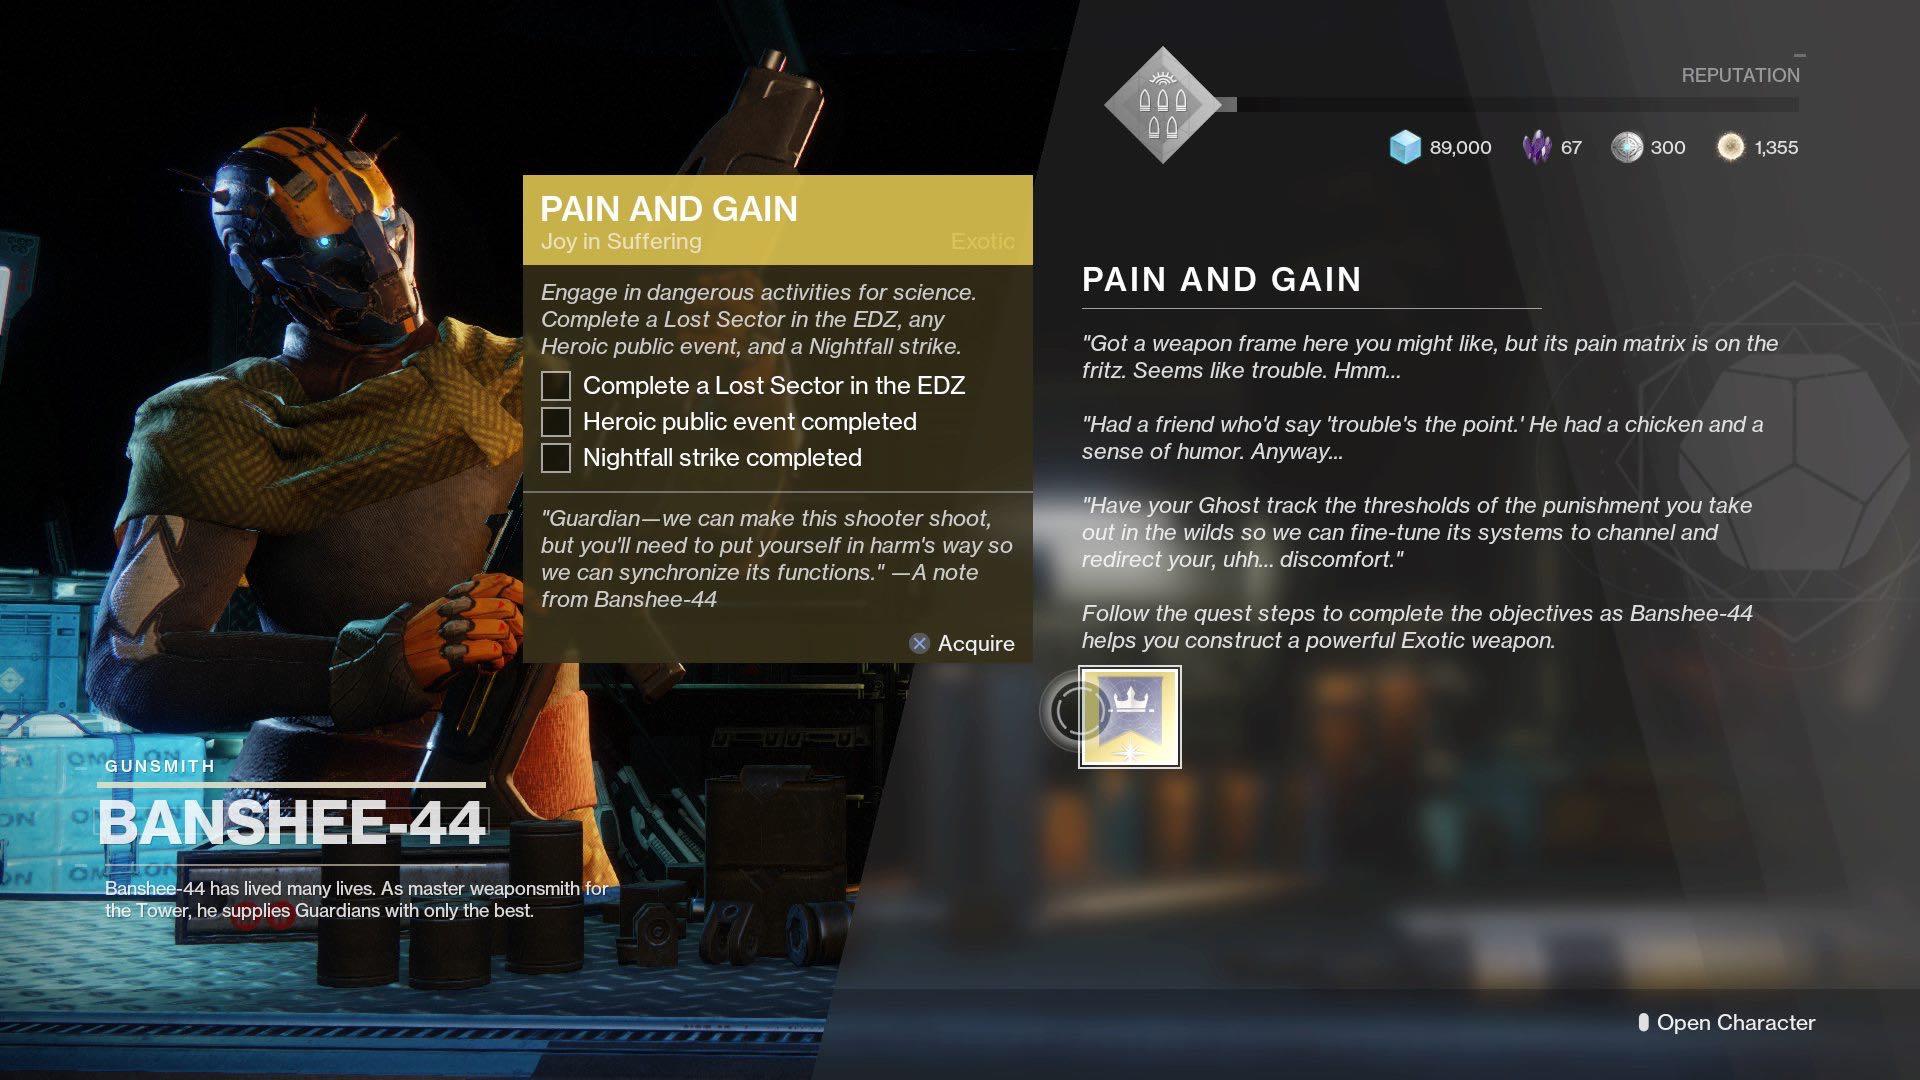 pain and gain destiny 2